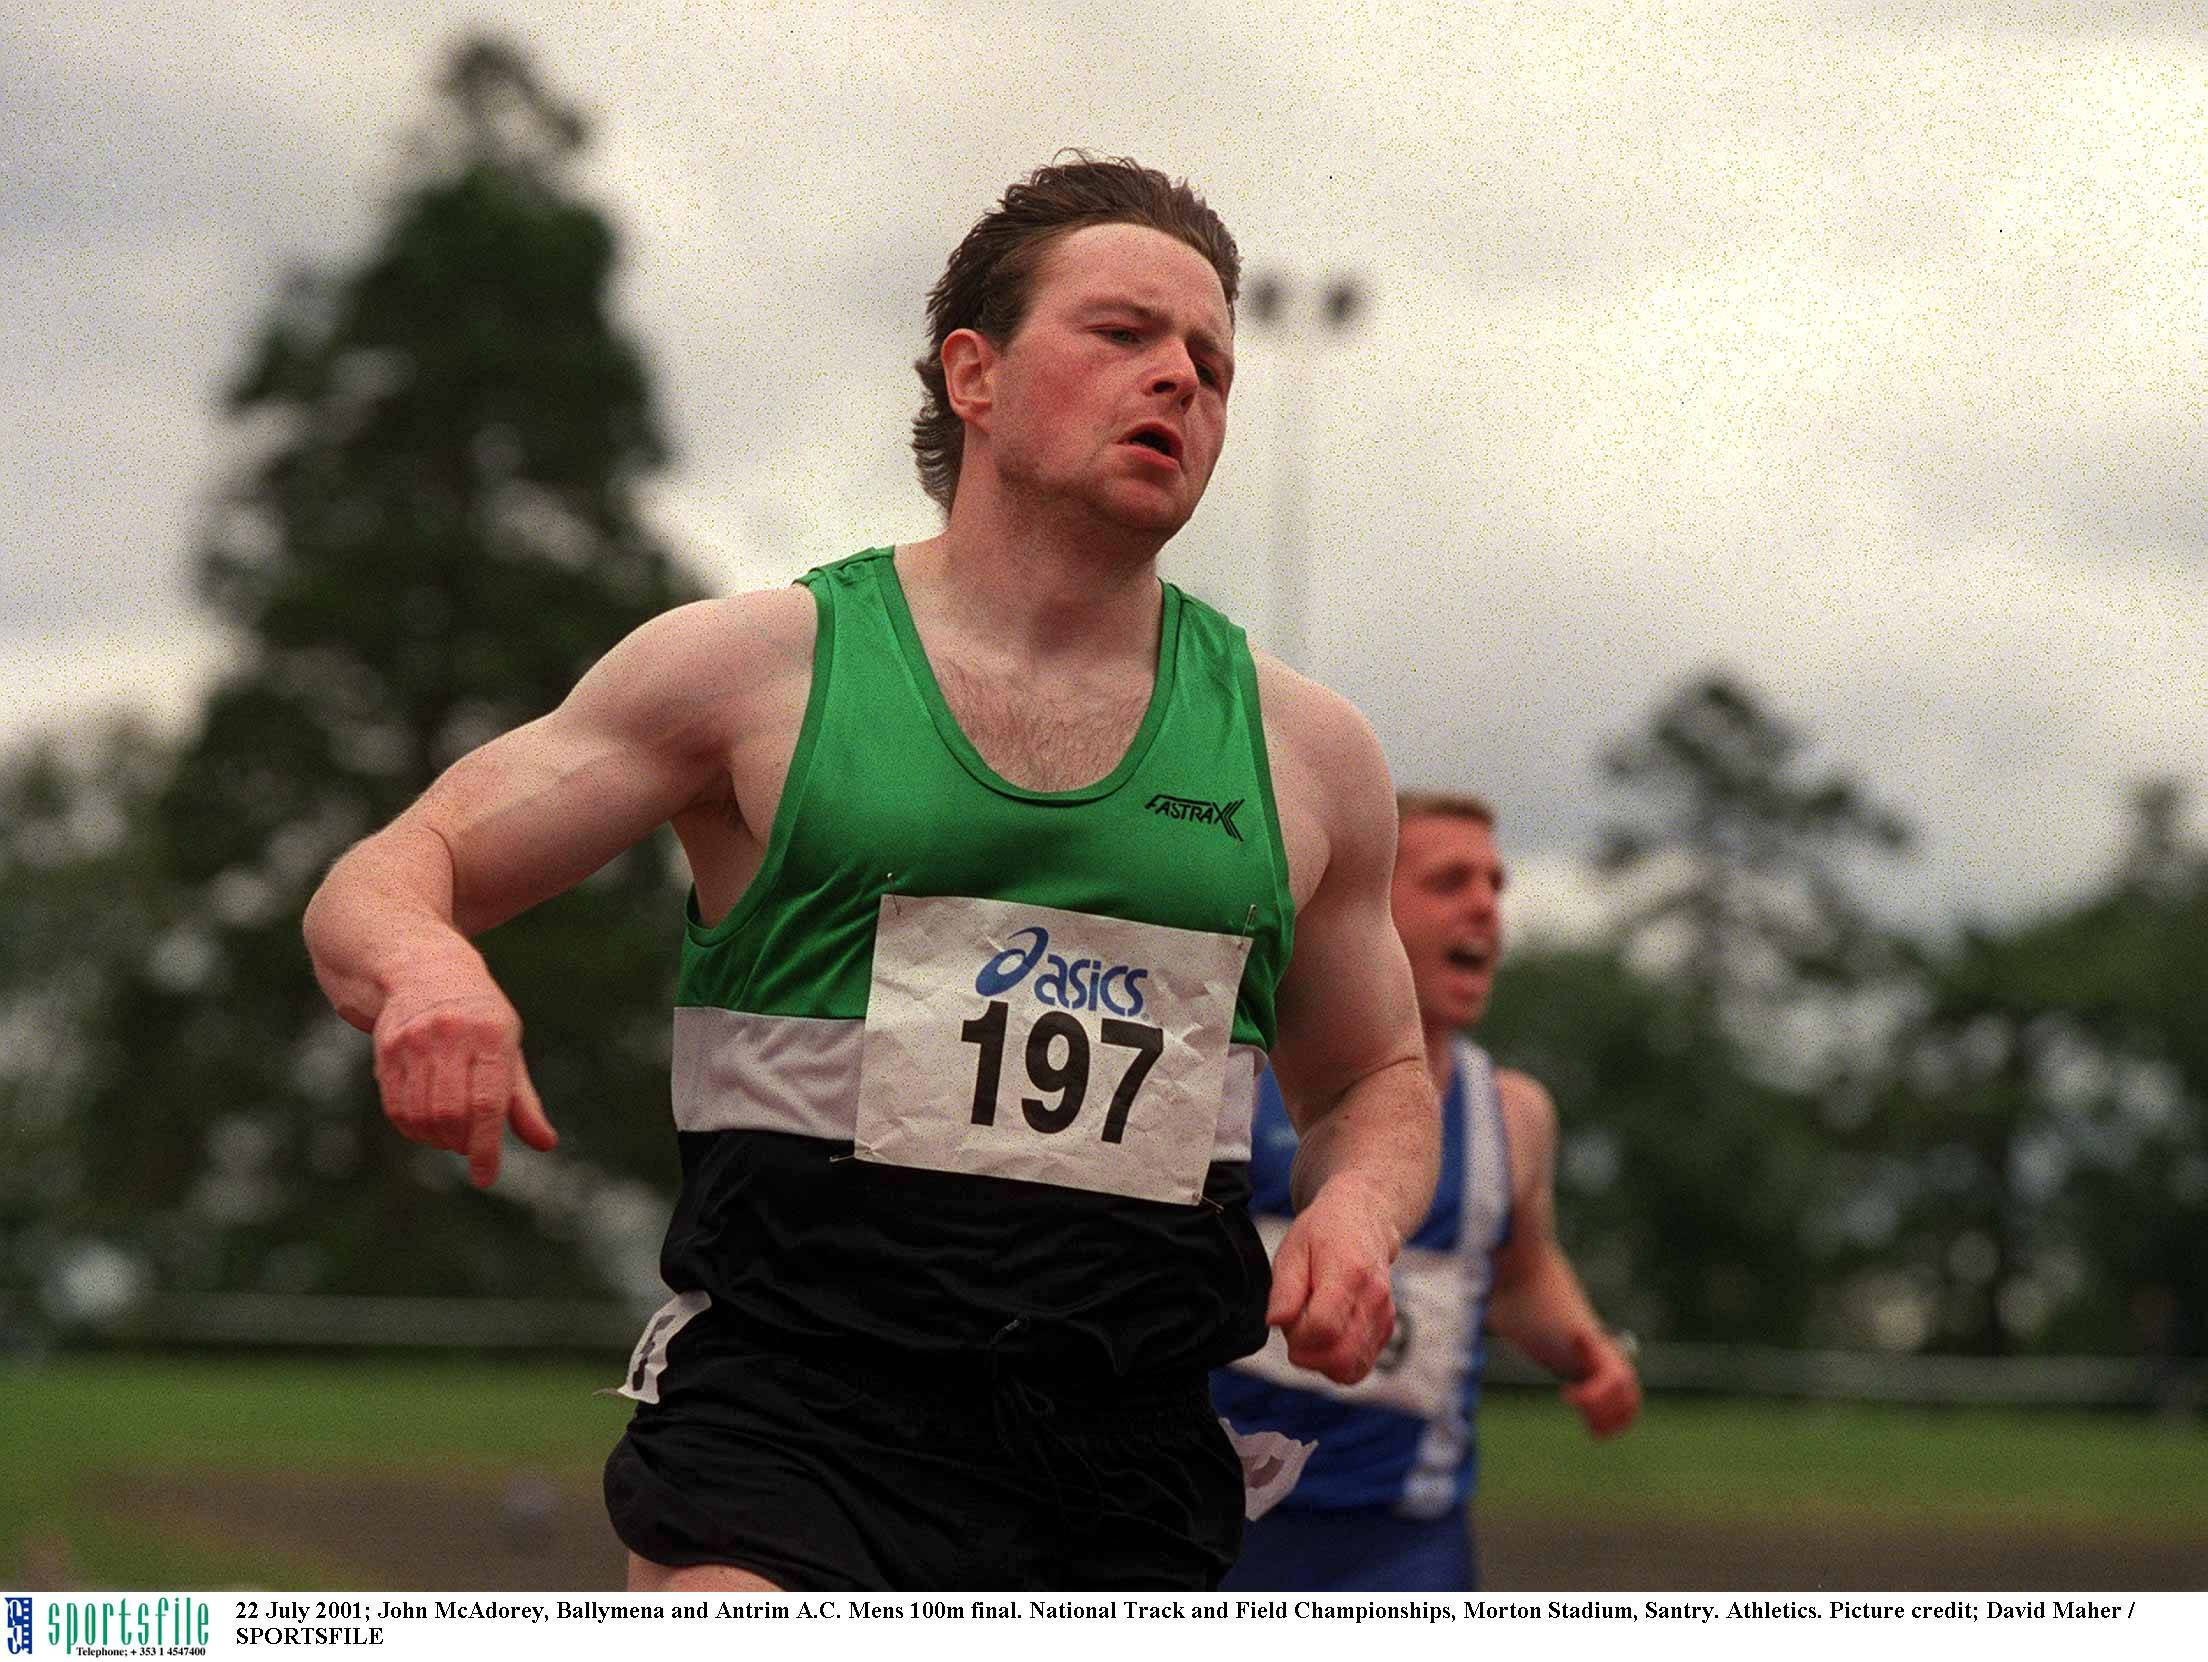 John McAdorey, Irish Olympic sprinter from Ballymena has died aged 45